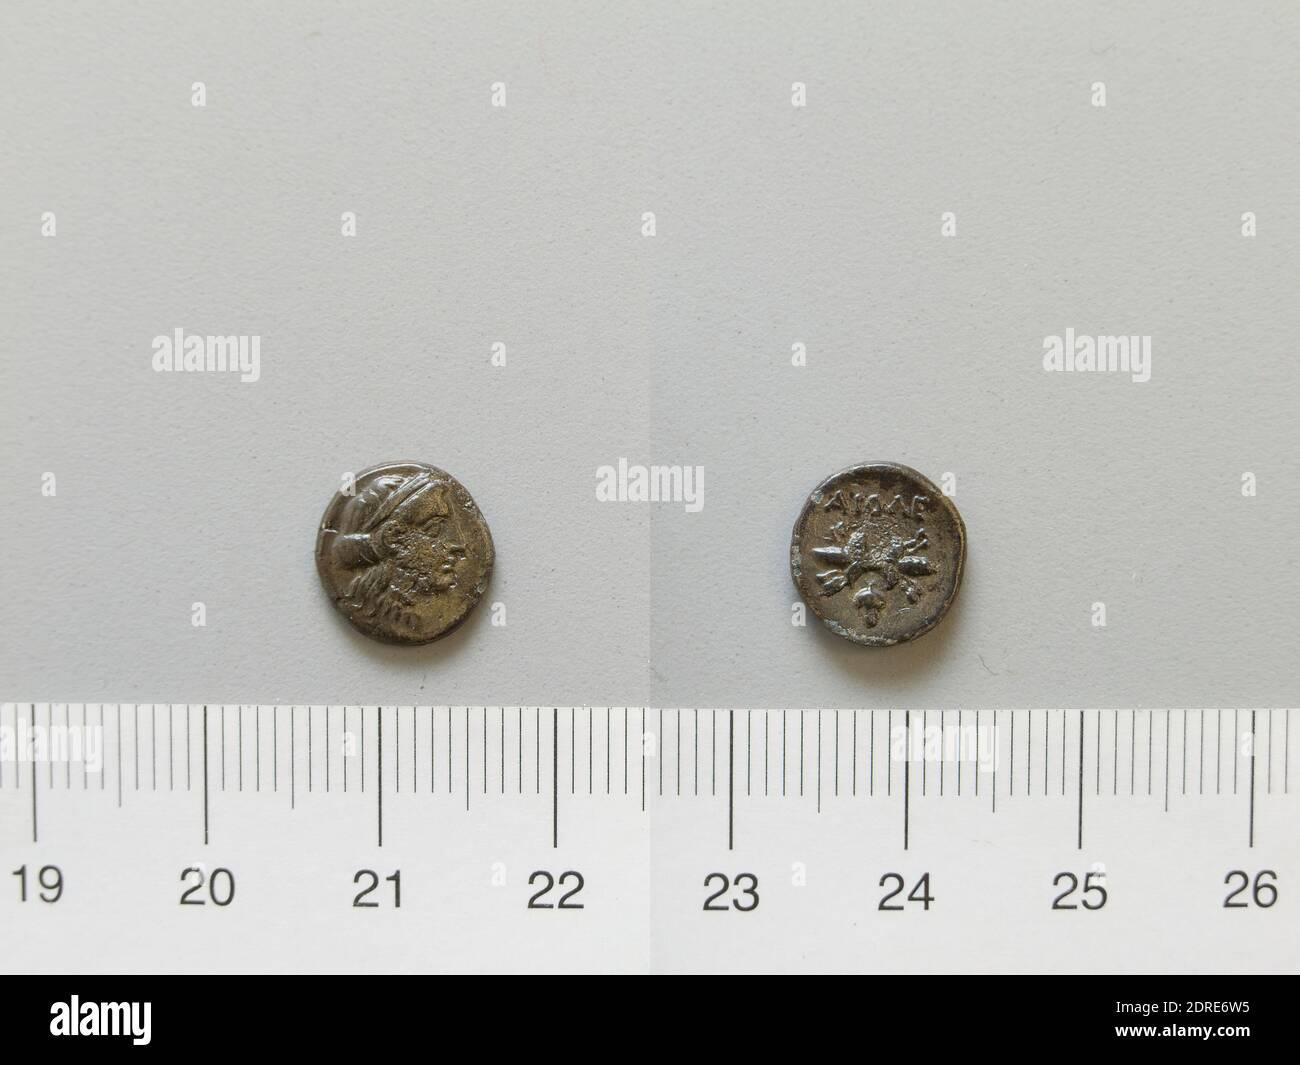 100 Cleavage rings 5 mm bronze 45.5